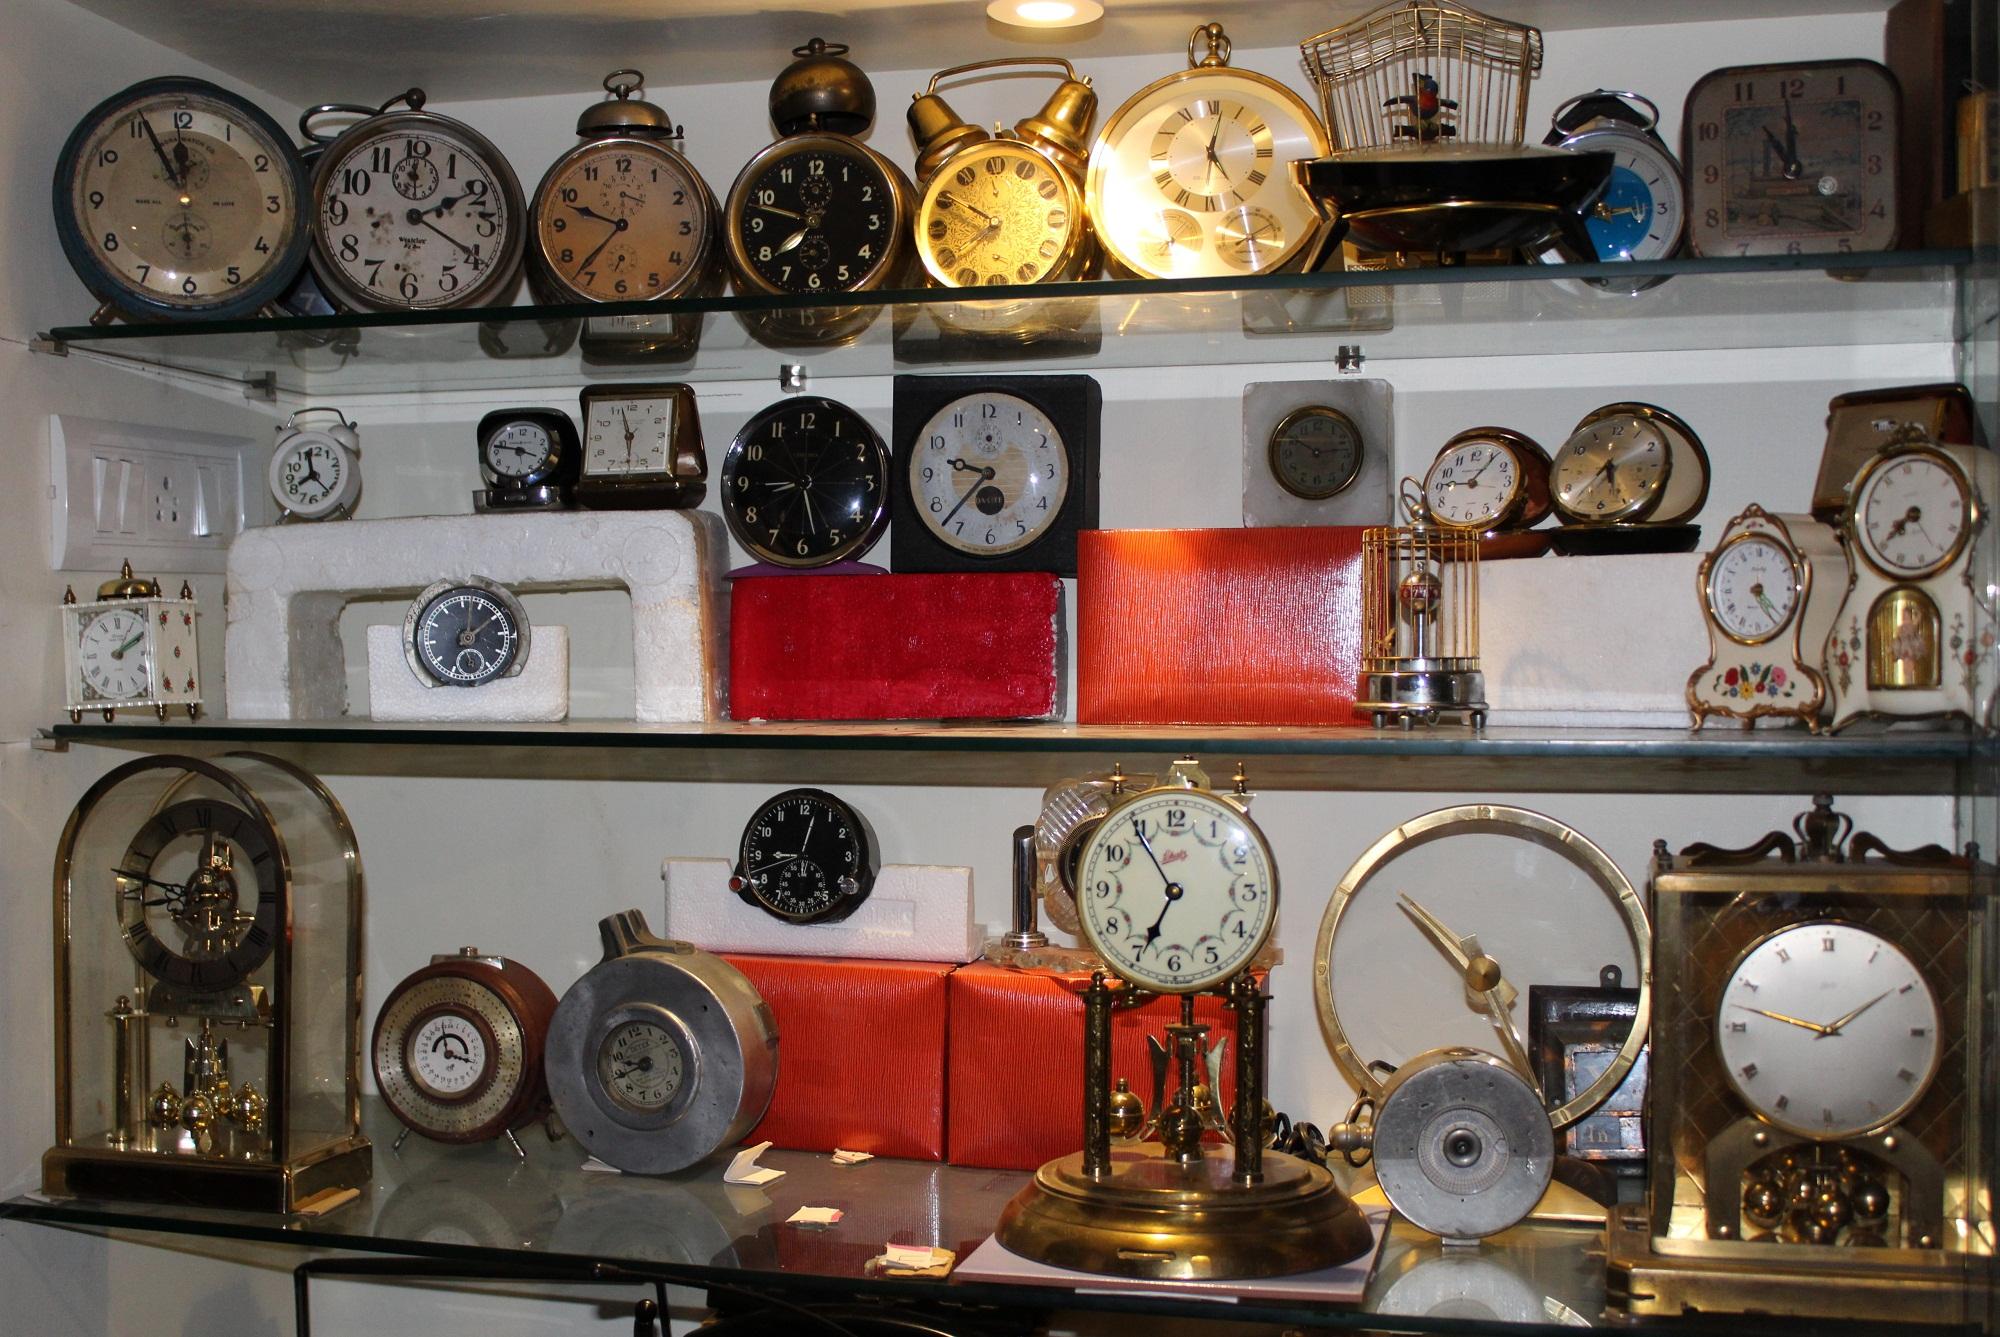 Chandrashekar collects vintage clocks. These require regular maintenance.